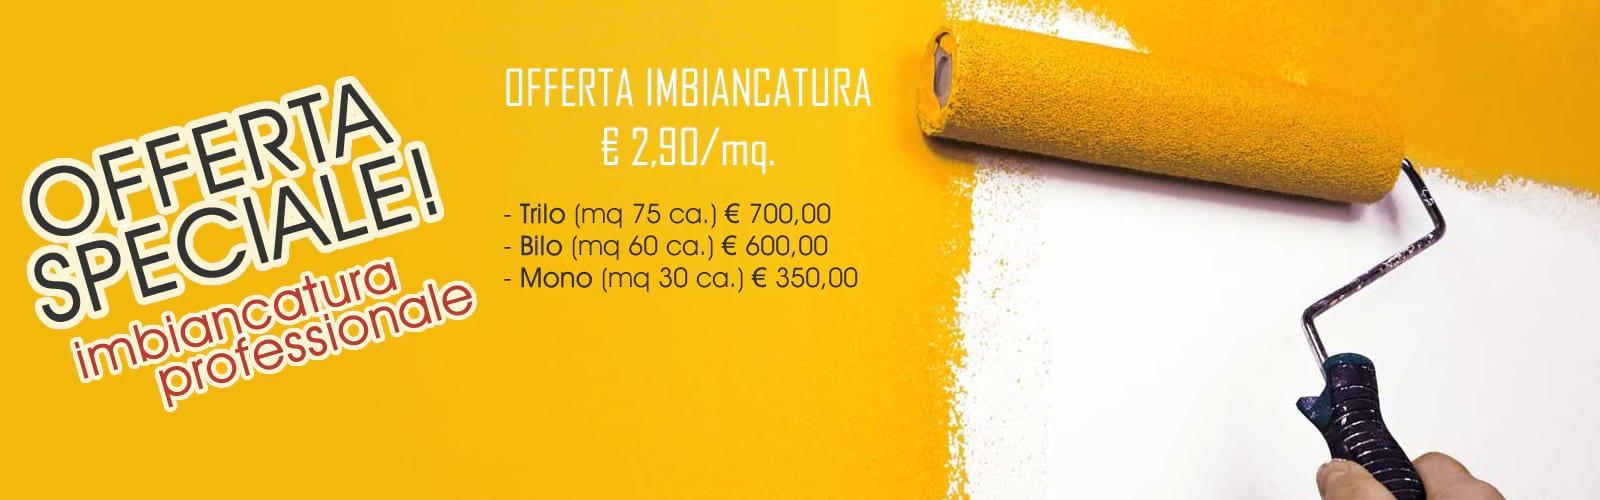 Offerta imbiancatura Milano